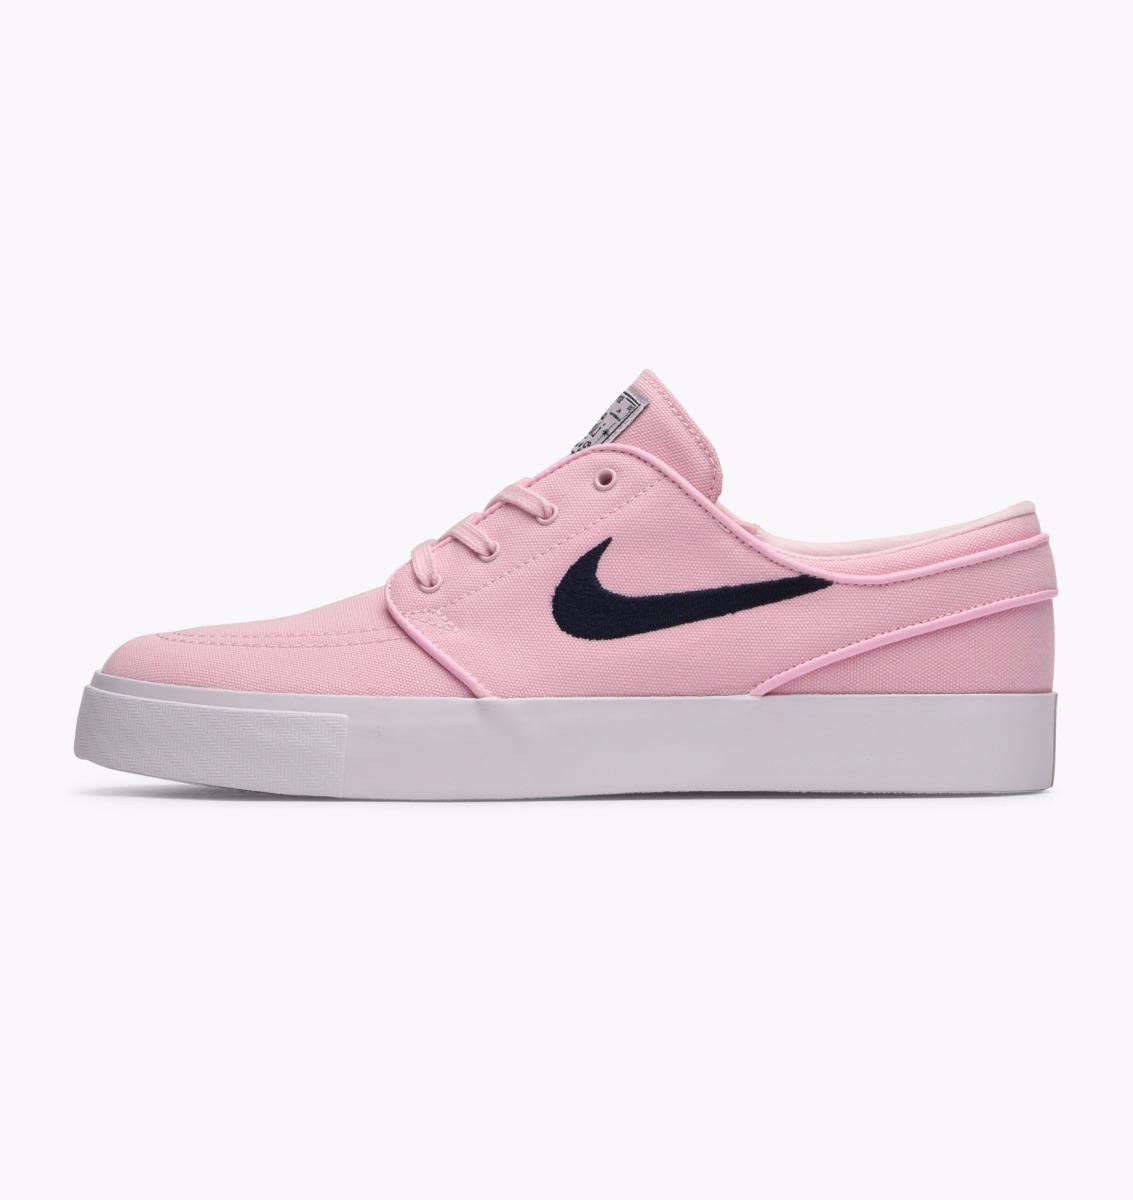 5bfb07f1667 Tênis Nike Sb Zoom Stefan Janoski Canvas - Skate Elite Pink - R  319 ...